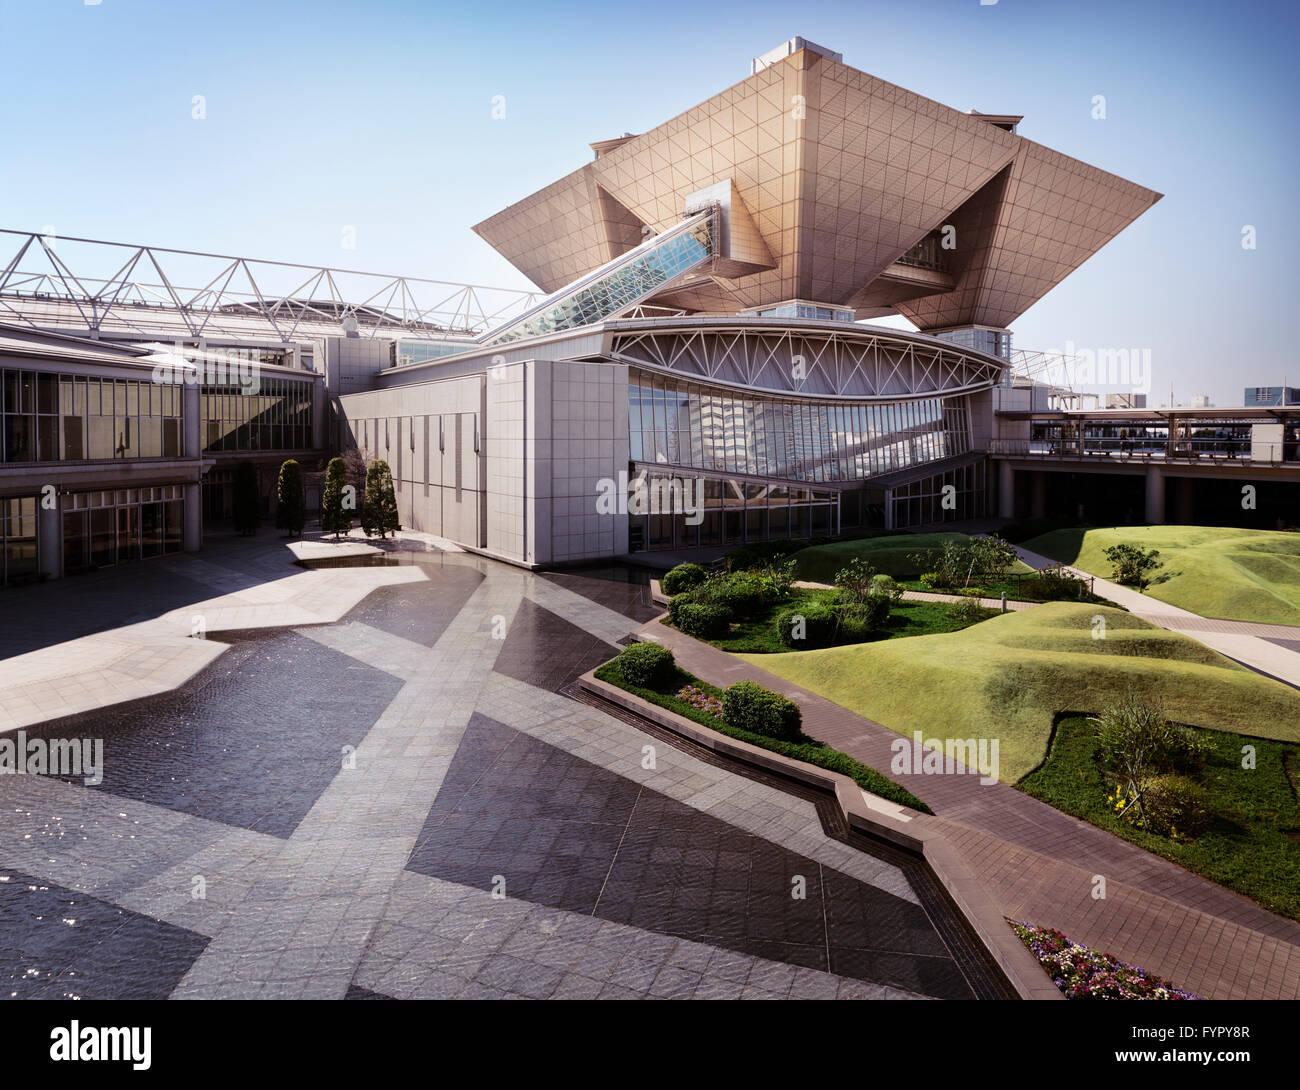 Tokyo Big Sight, ou Tokyo International Exhibition Center, Ariake, Tokyo, Japon Photo Stock